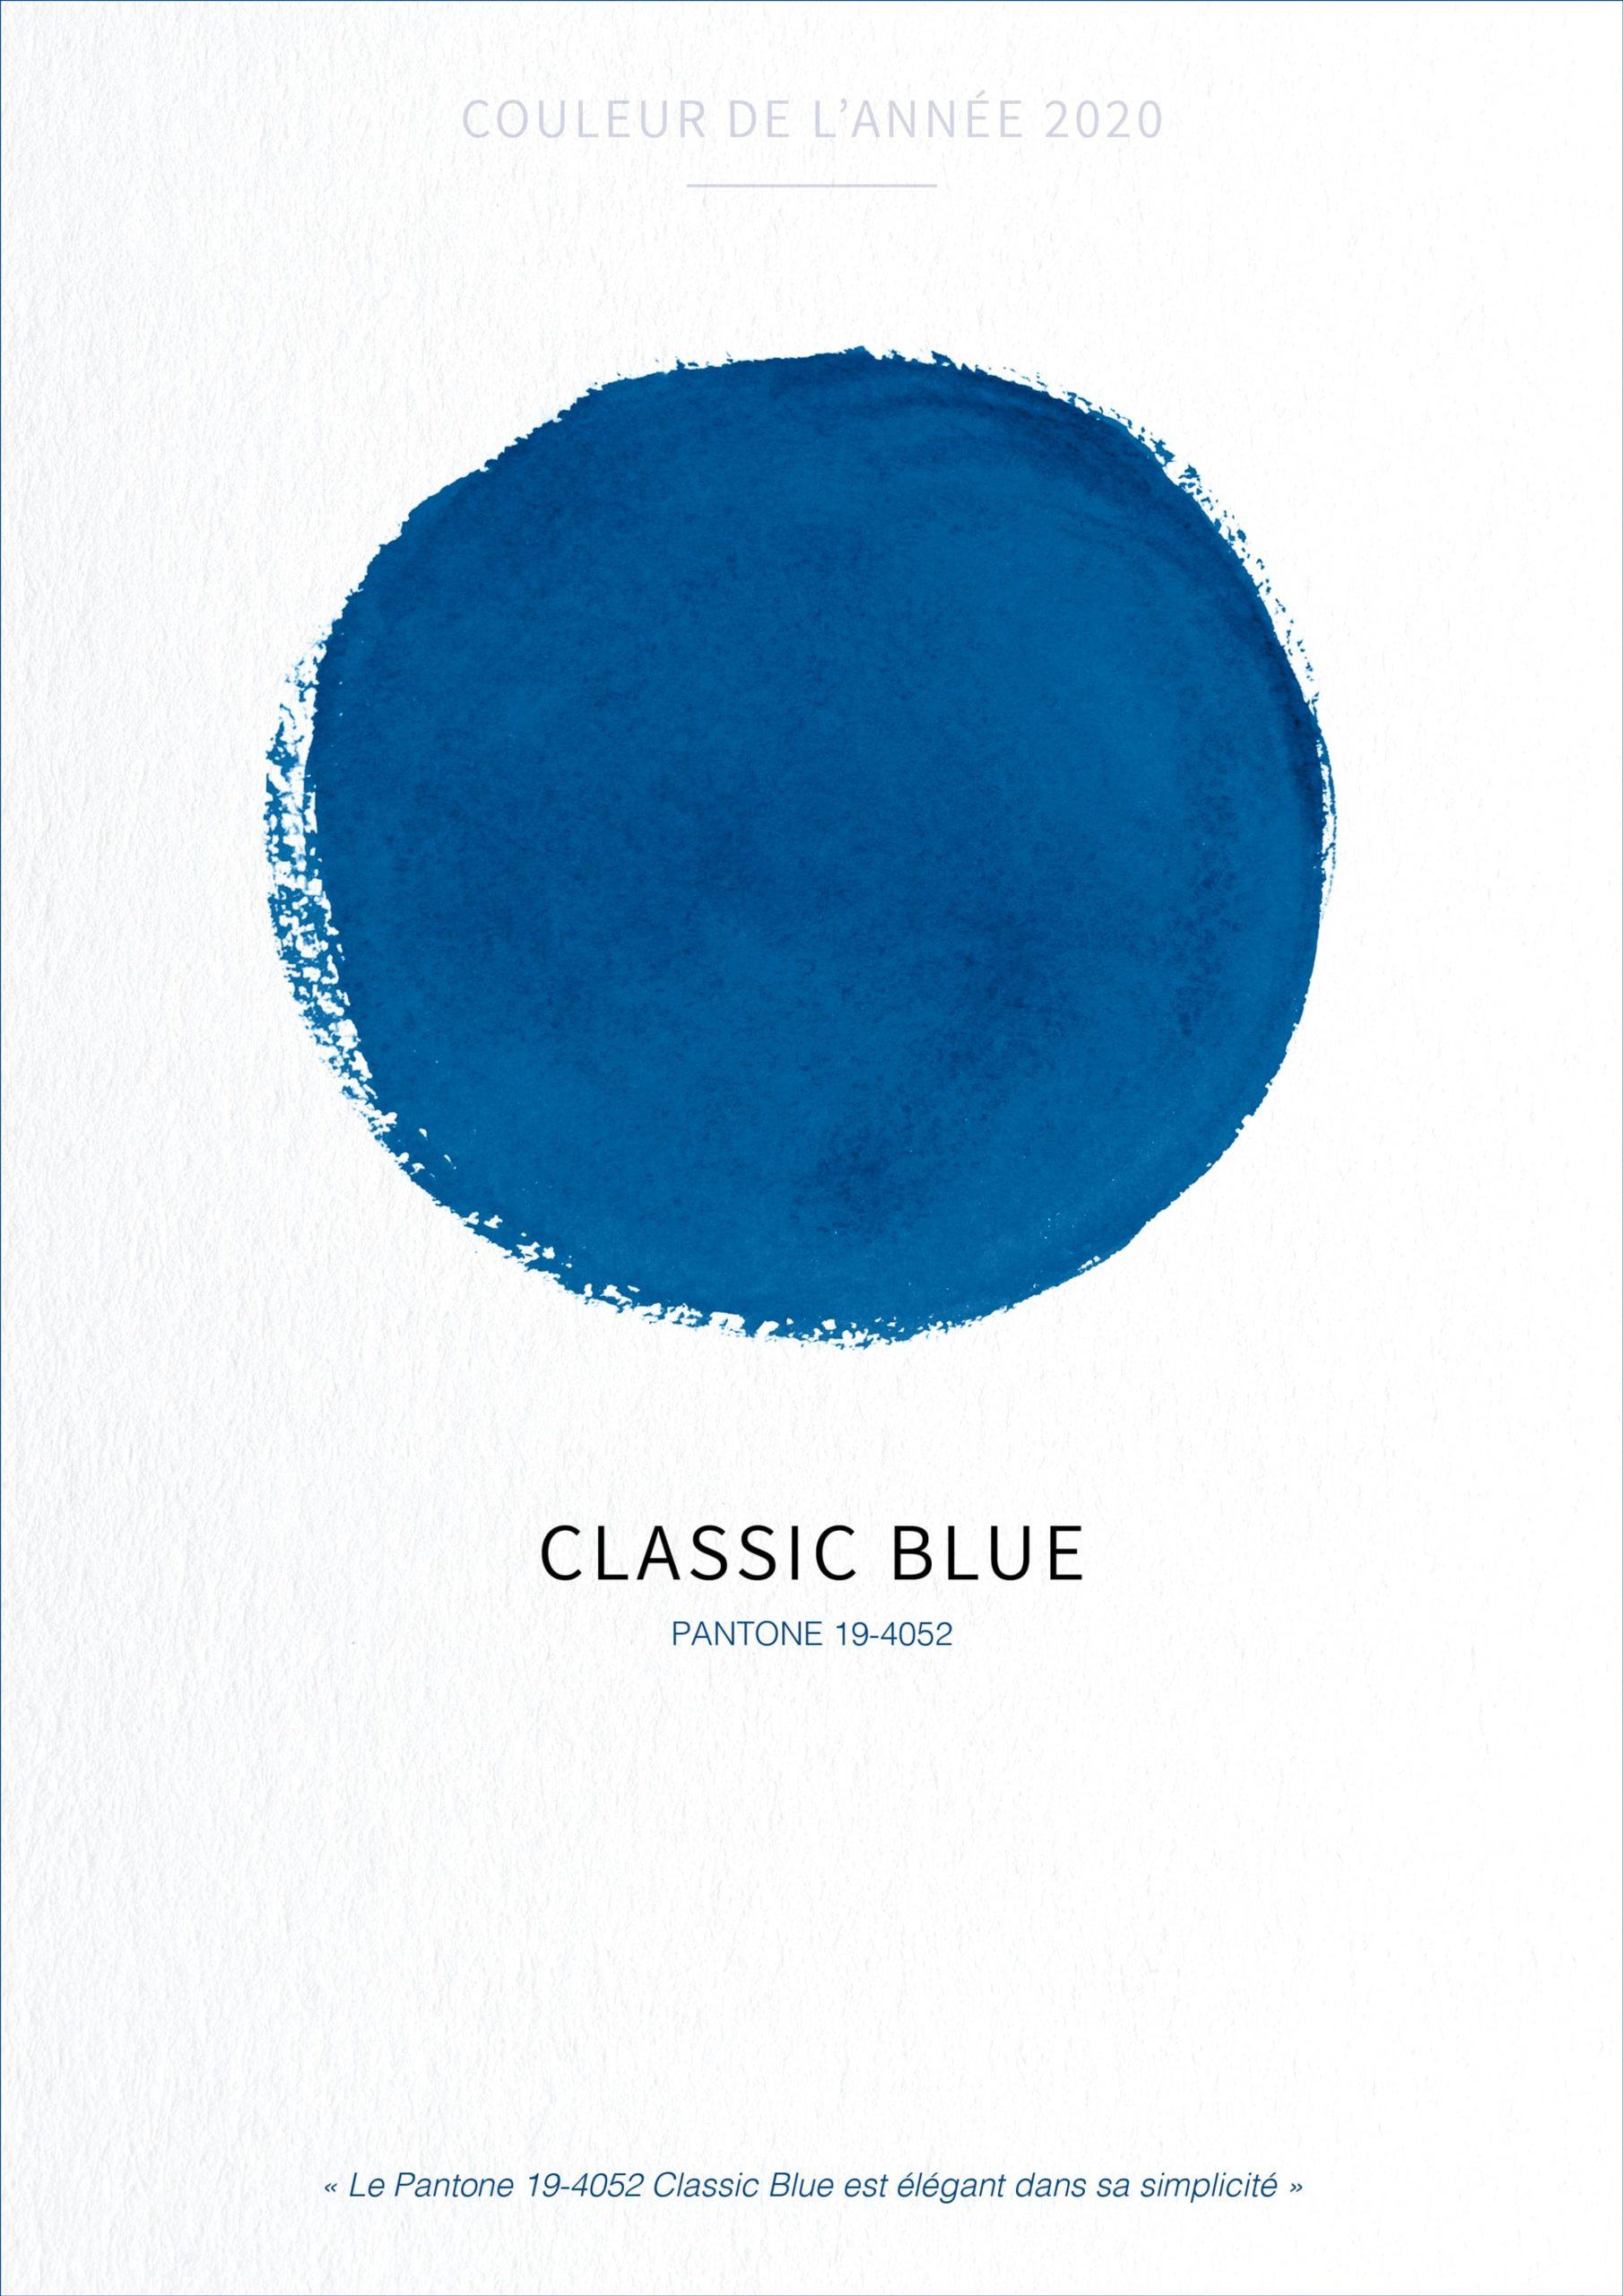 couleur-2020-pantone-bleu